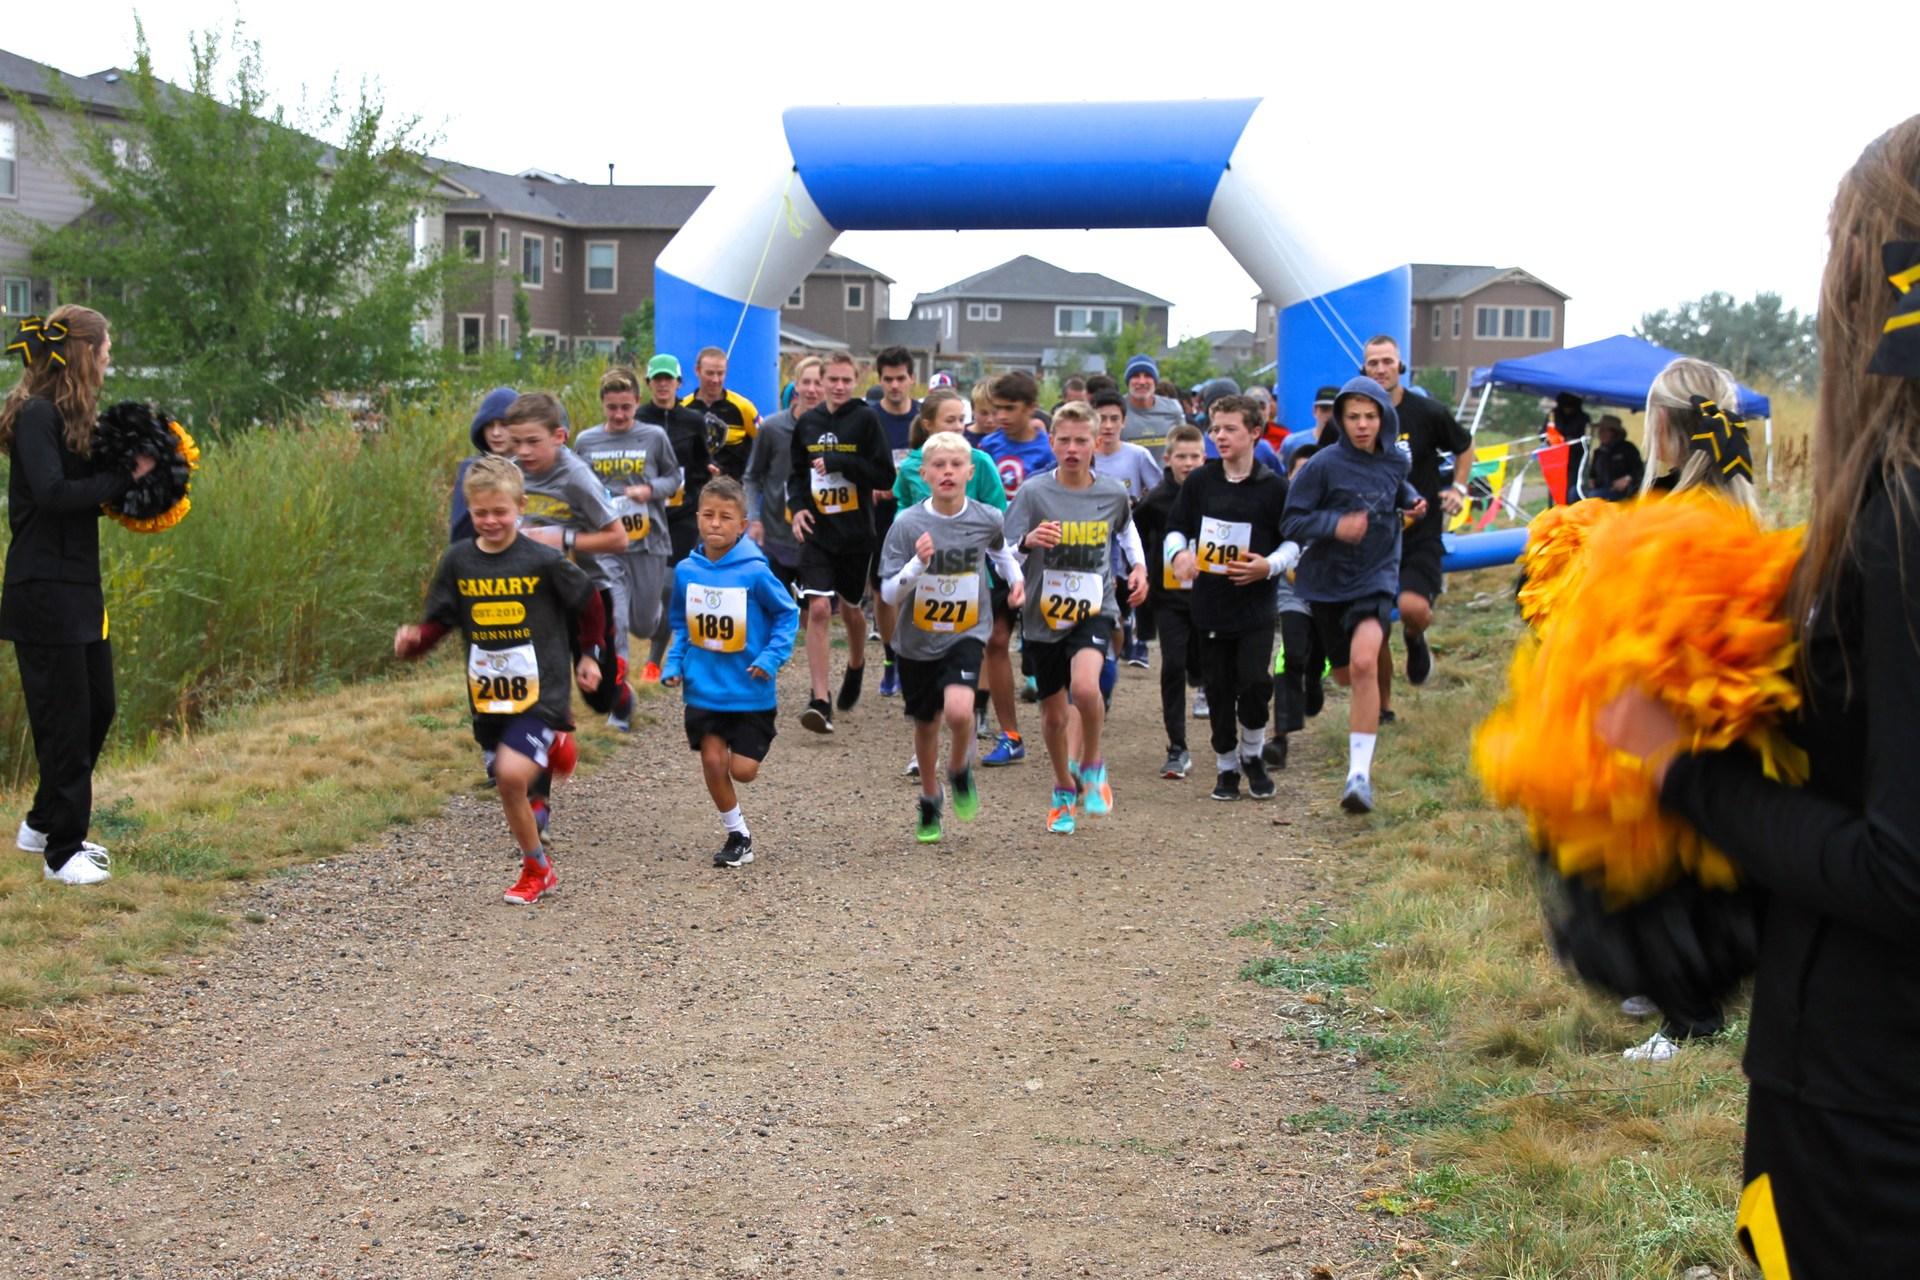 Race begins for Miner Gold Rush 4-mile